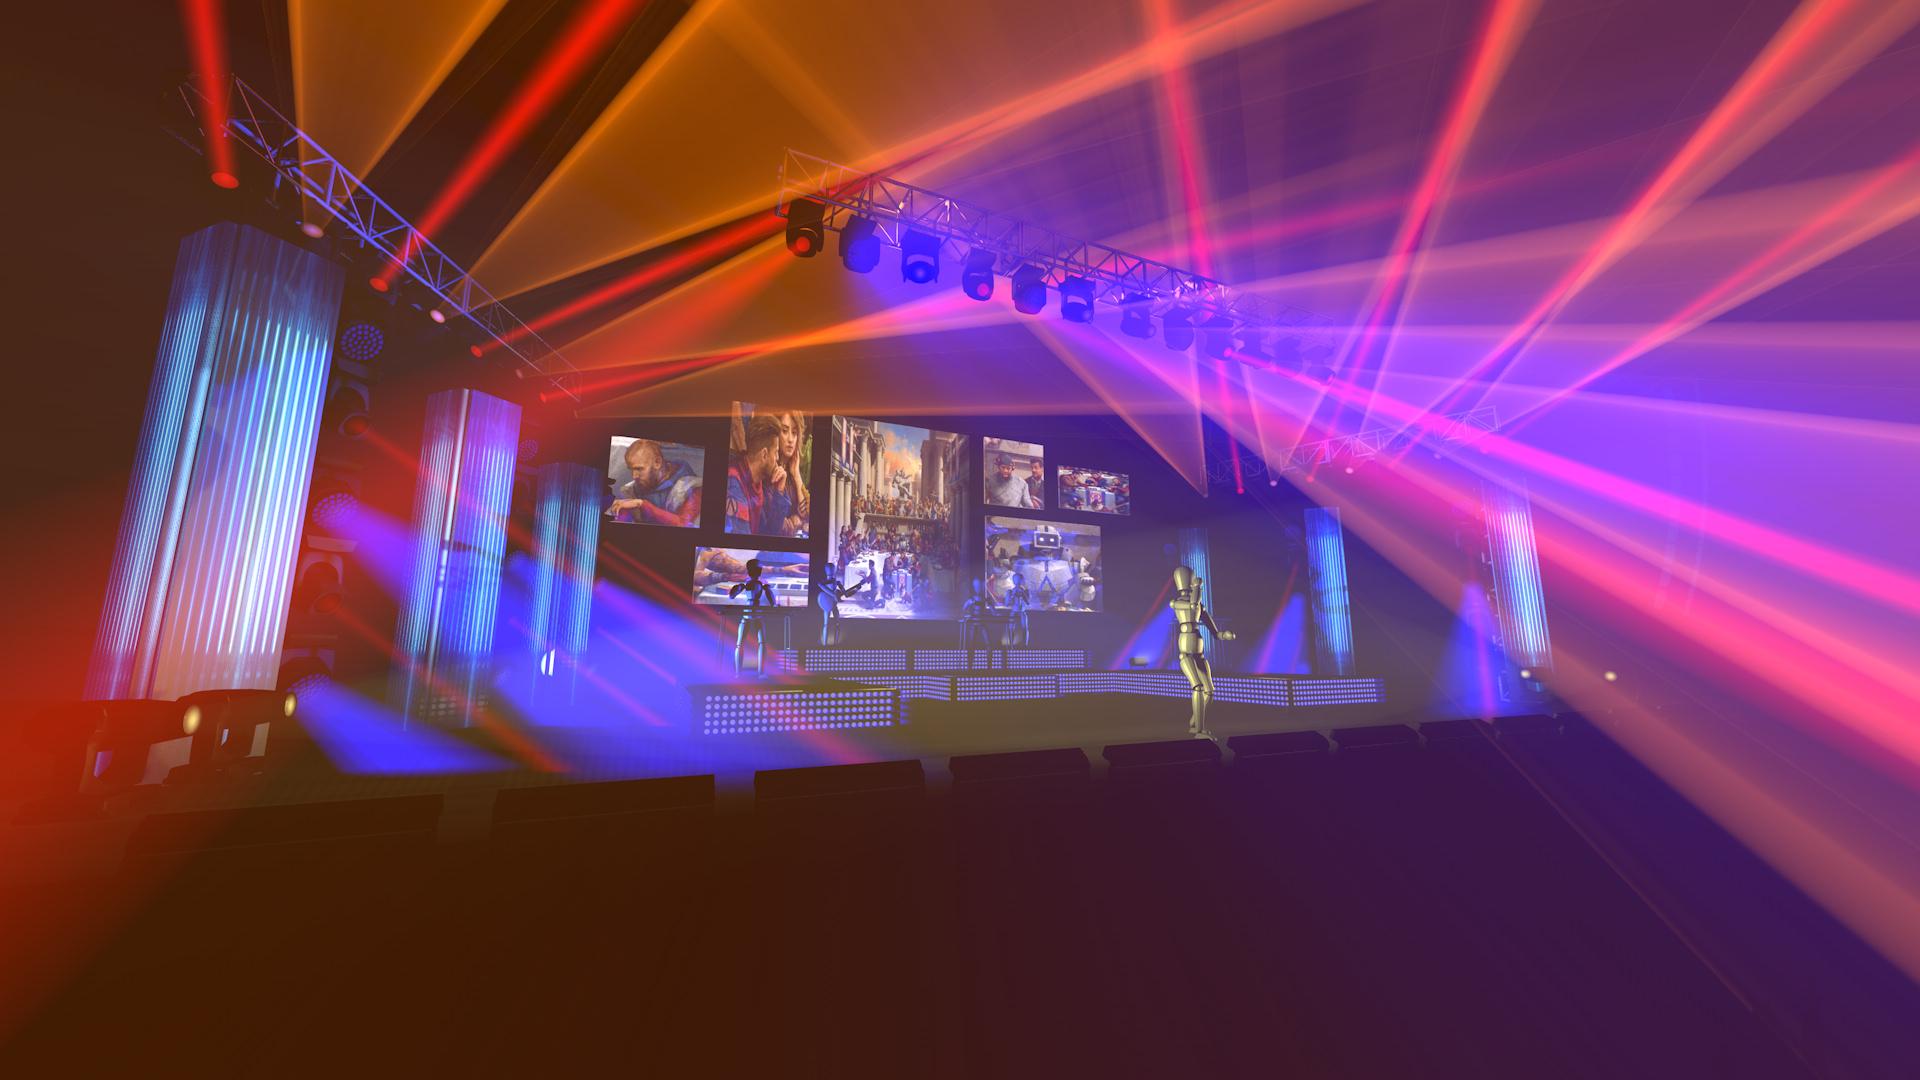 3D Rendering of Stage Design